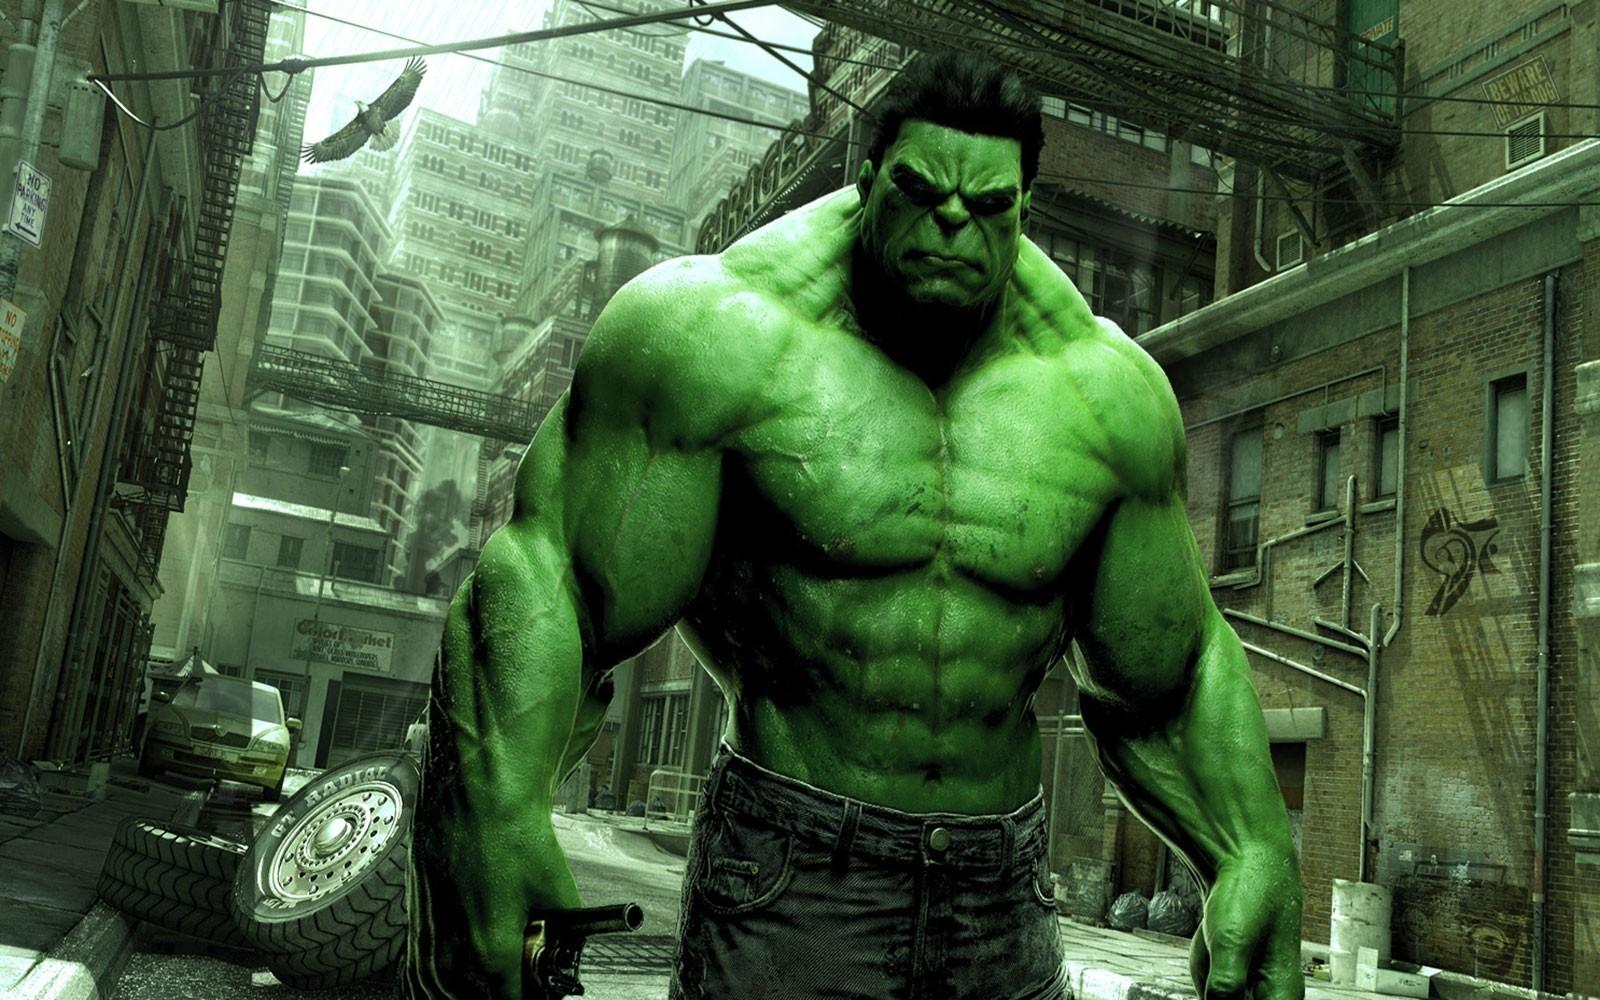 Green marvel comics hulk wallpaper 12410 PC en 1600x1000